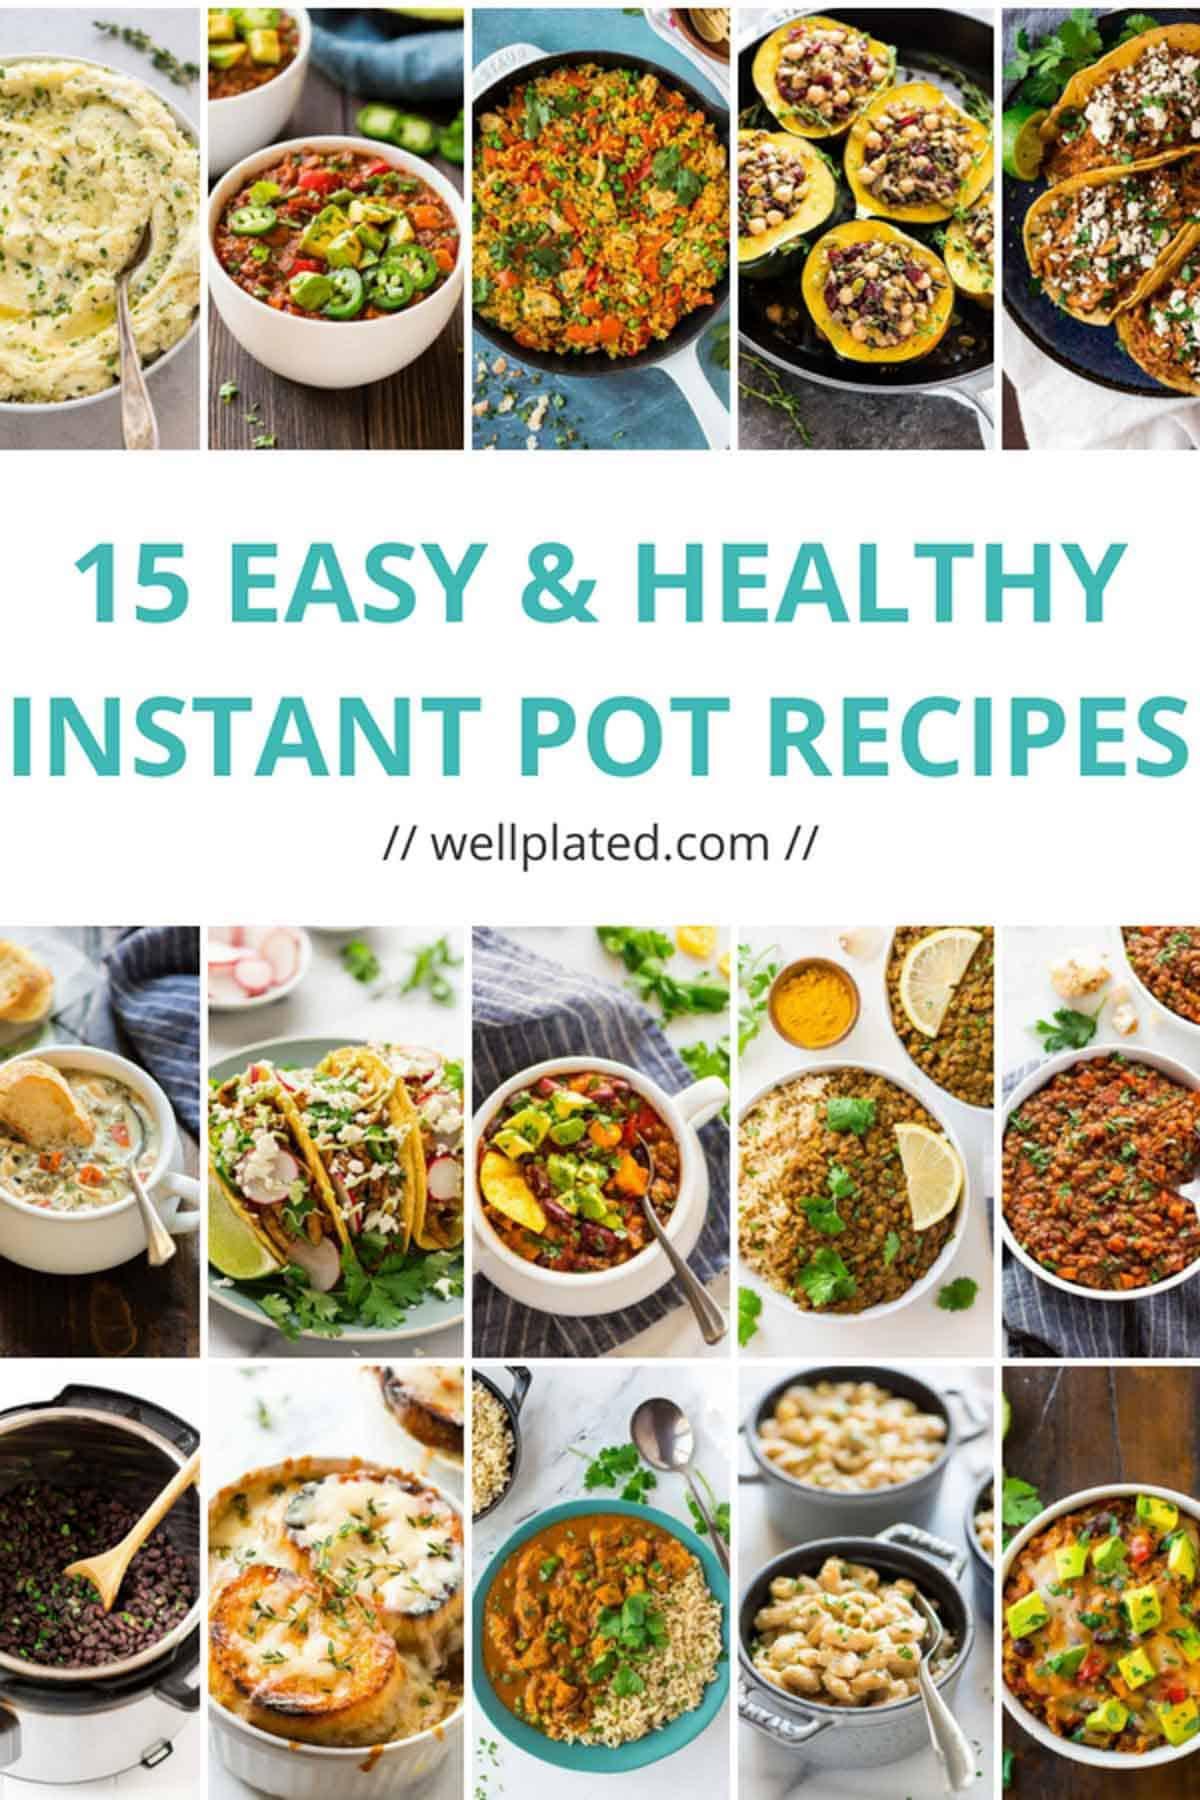 Instant Pot Recipes Healthy  15 Healthy Instant Pot Recipes That Anyone Can Make